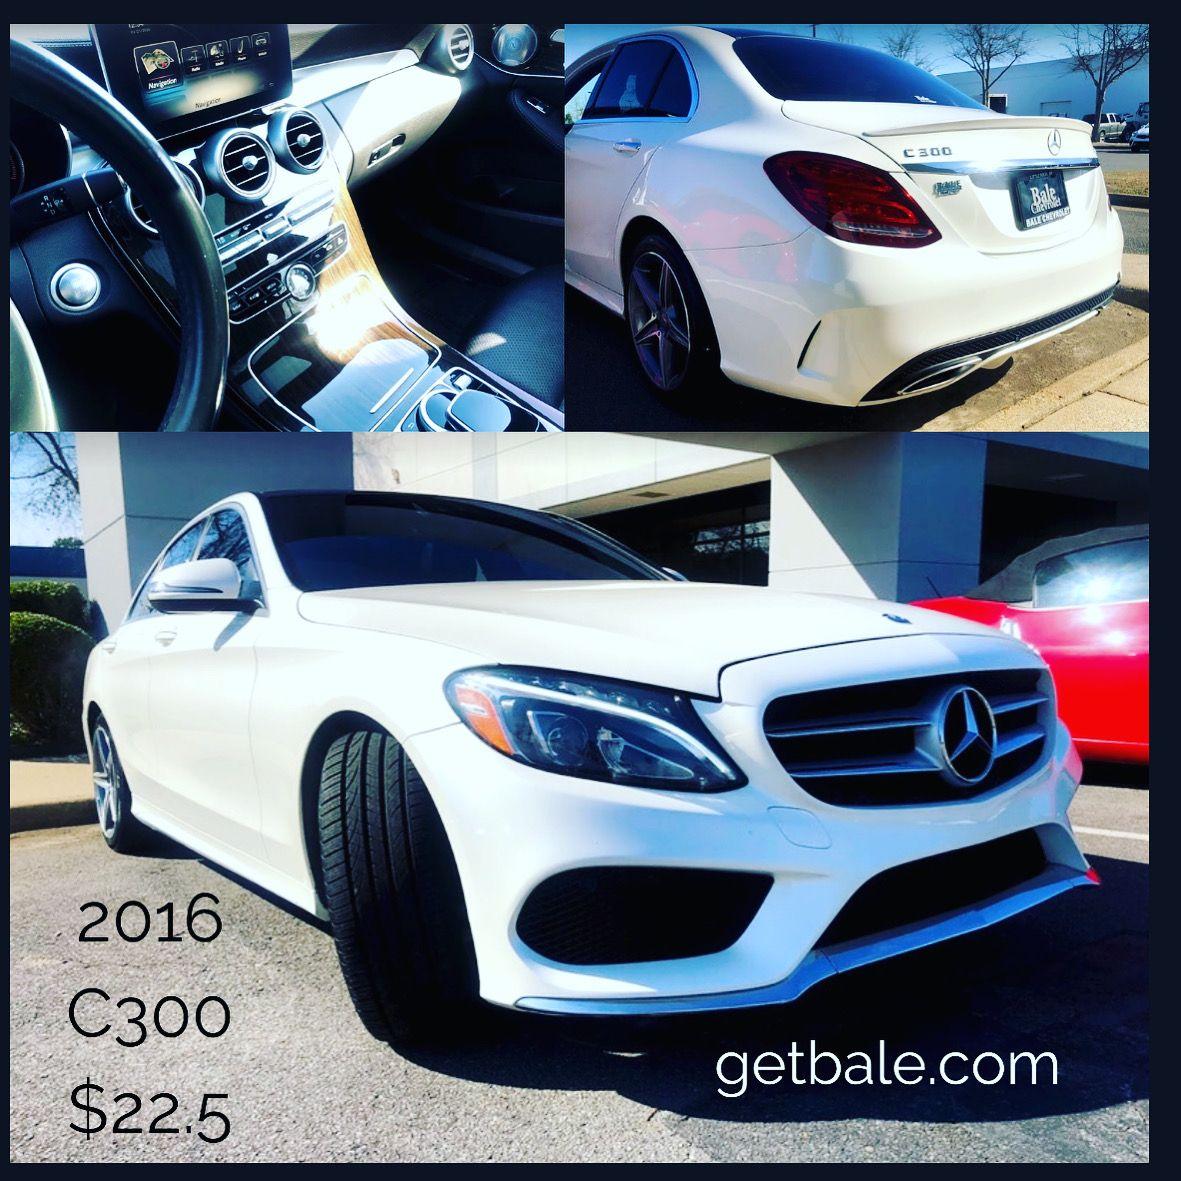 C300 Mercedes Awd Sale Getbale Desirelovell Mercedes Benz C300 Mercedes C300 Benz C